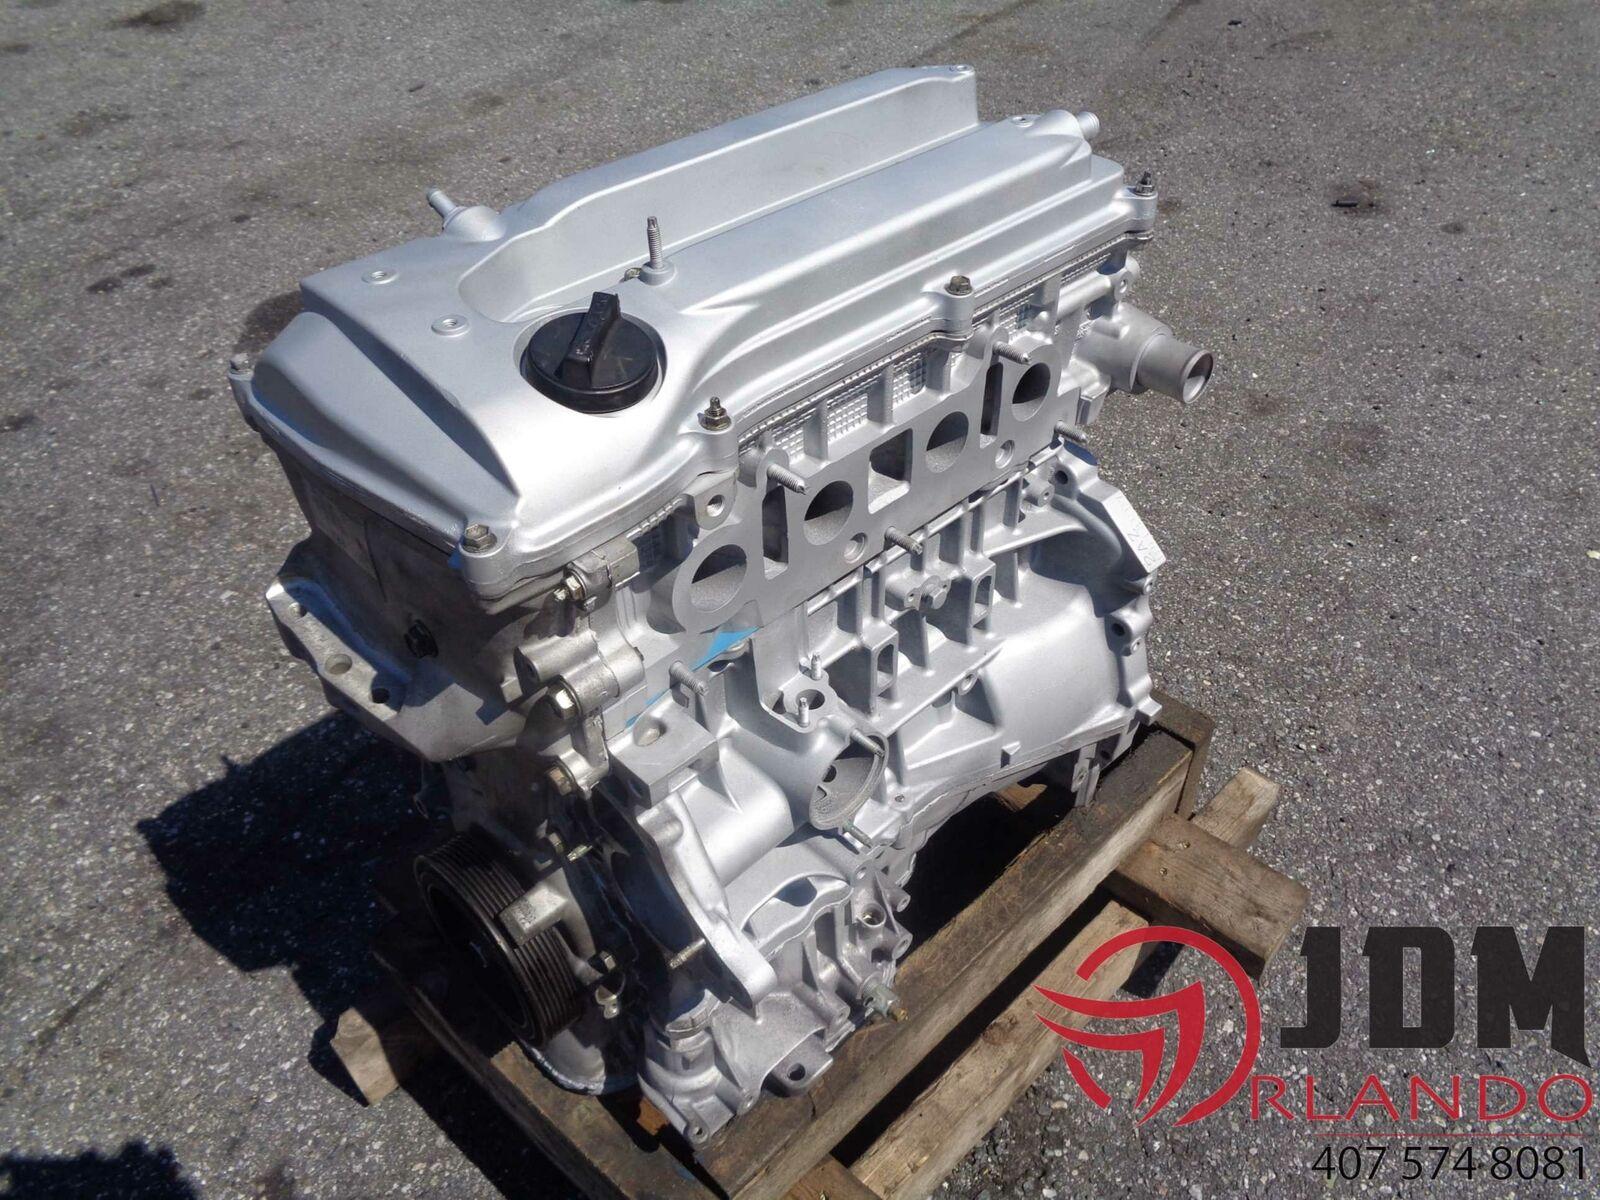 09-10 PONTIAC VIBE 2 4L 4 CYL RE-MANUFACTURED JDM ENGINE 2AZ-FE 2AZ